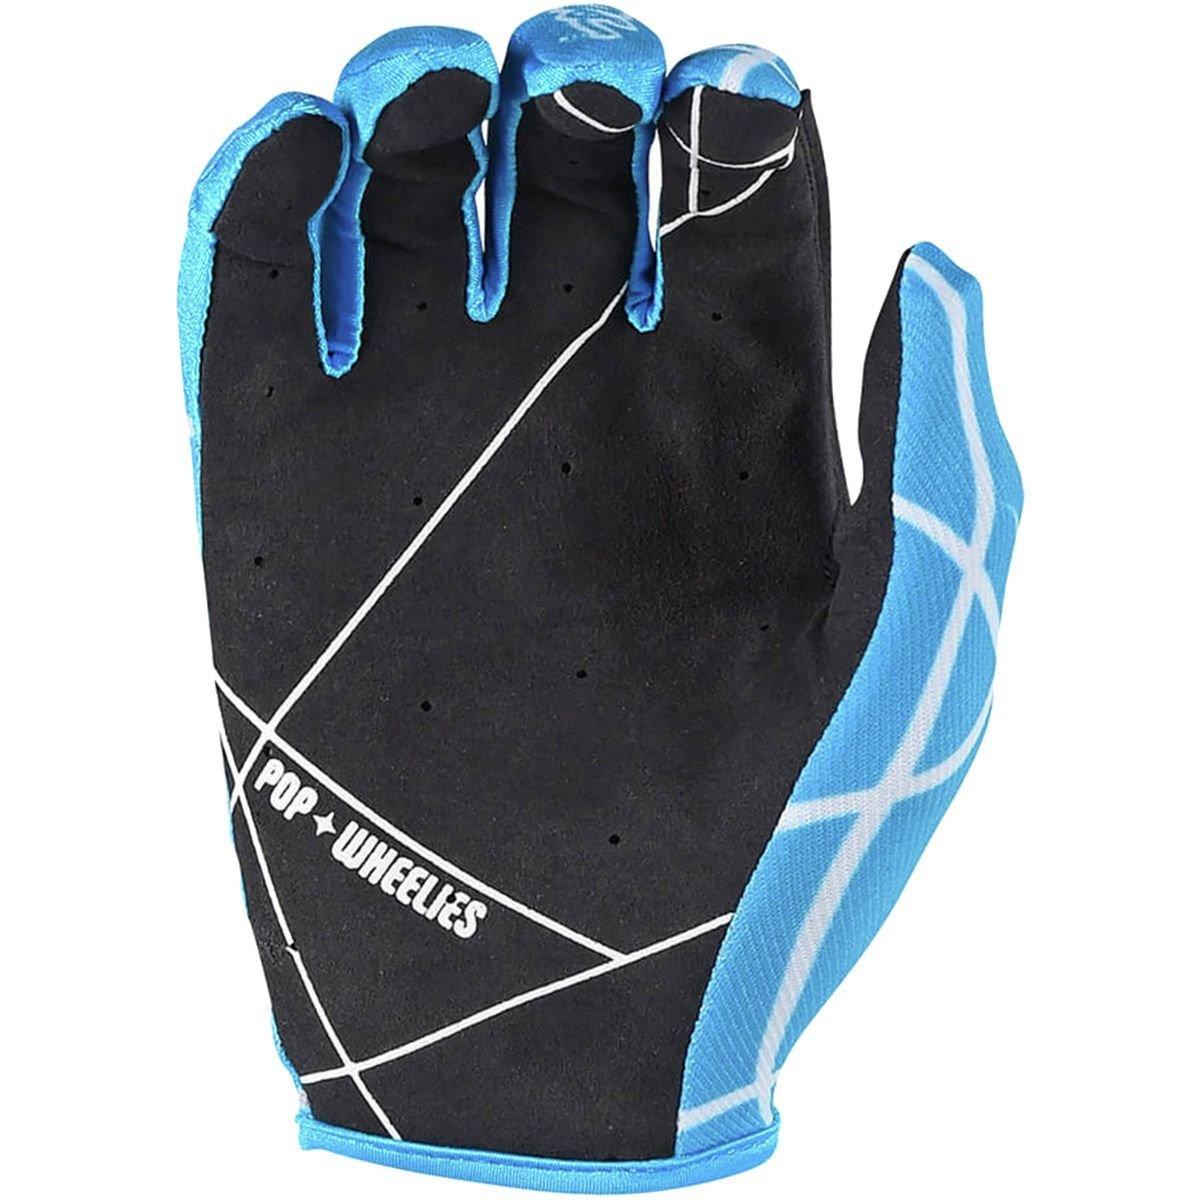 2017 Troy Lee Designs Air Gloves-Light Blue-2XL